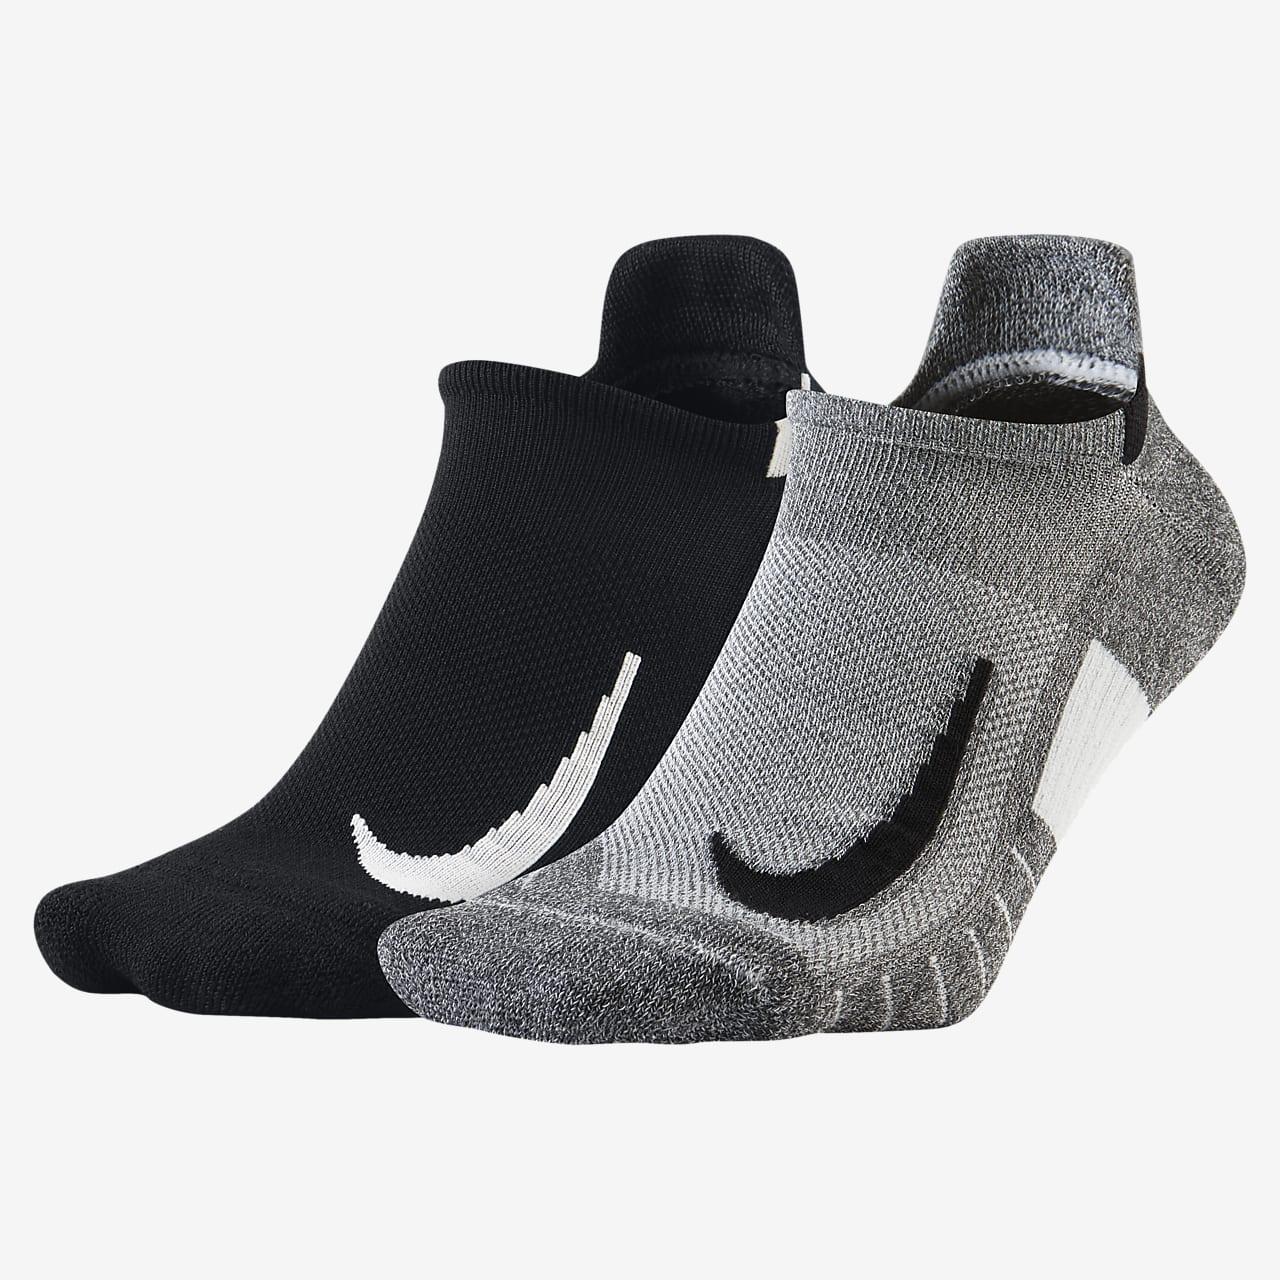 Nike Multiplier Running No-Show Socks (2 Pairs)